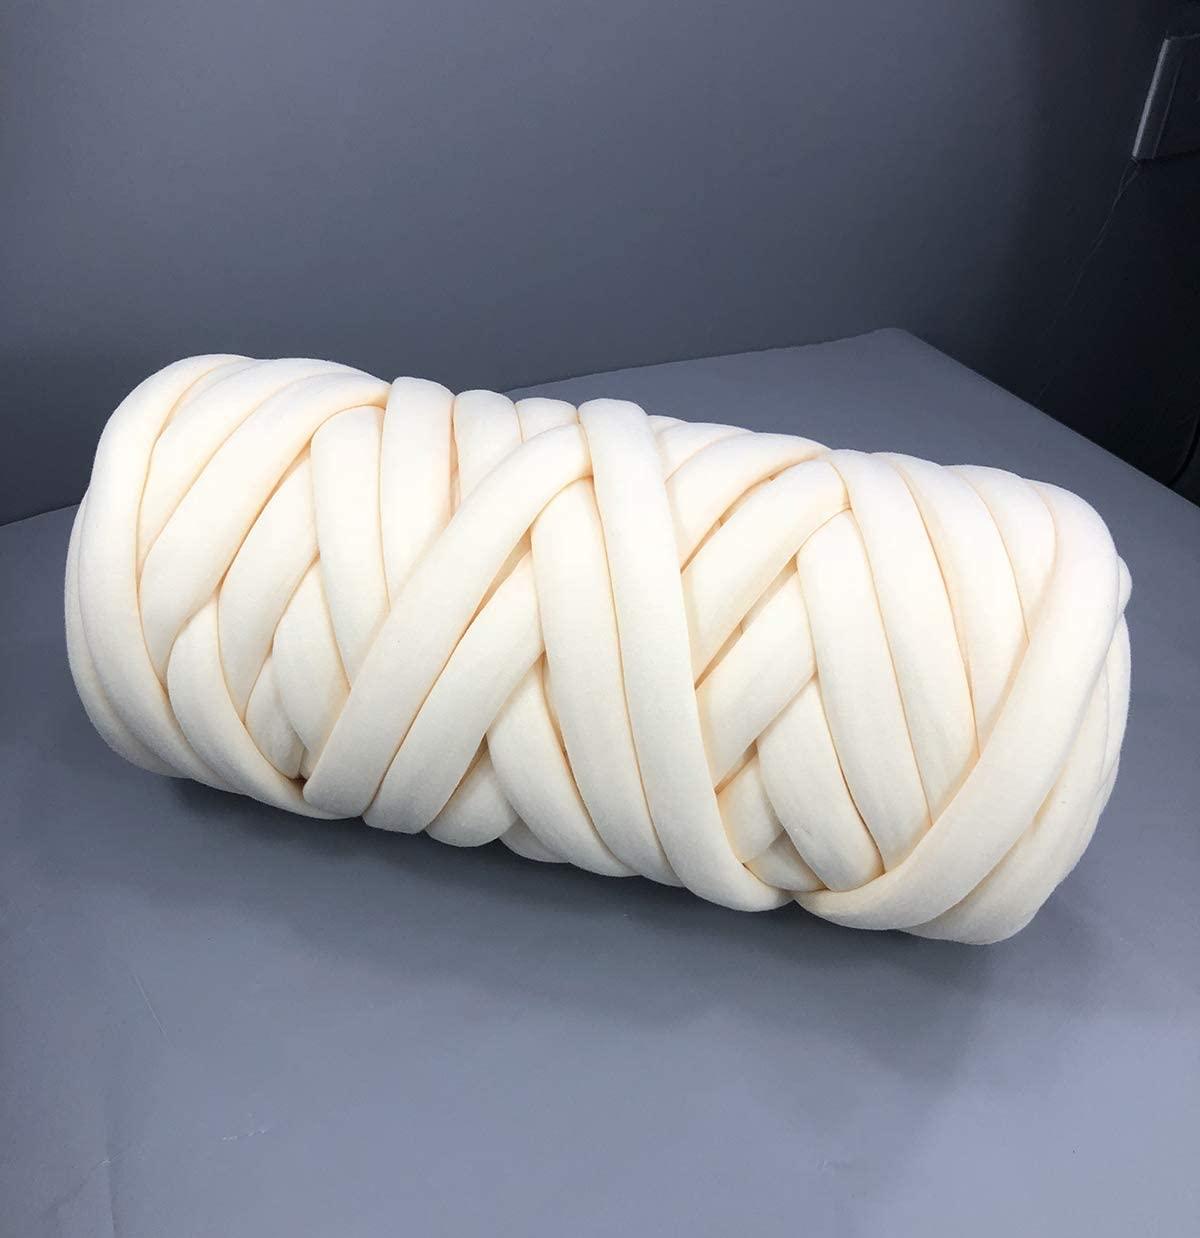 Chunky Cotton Tube Yarn Thick Vegan Yarn Merino Wool Alternative DIY Bulky Knitting Blanket Hand Knitting Spin Yarn Machine Washable Beige 4.4 LB